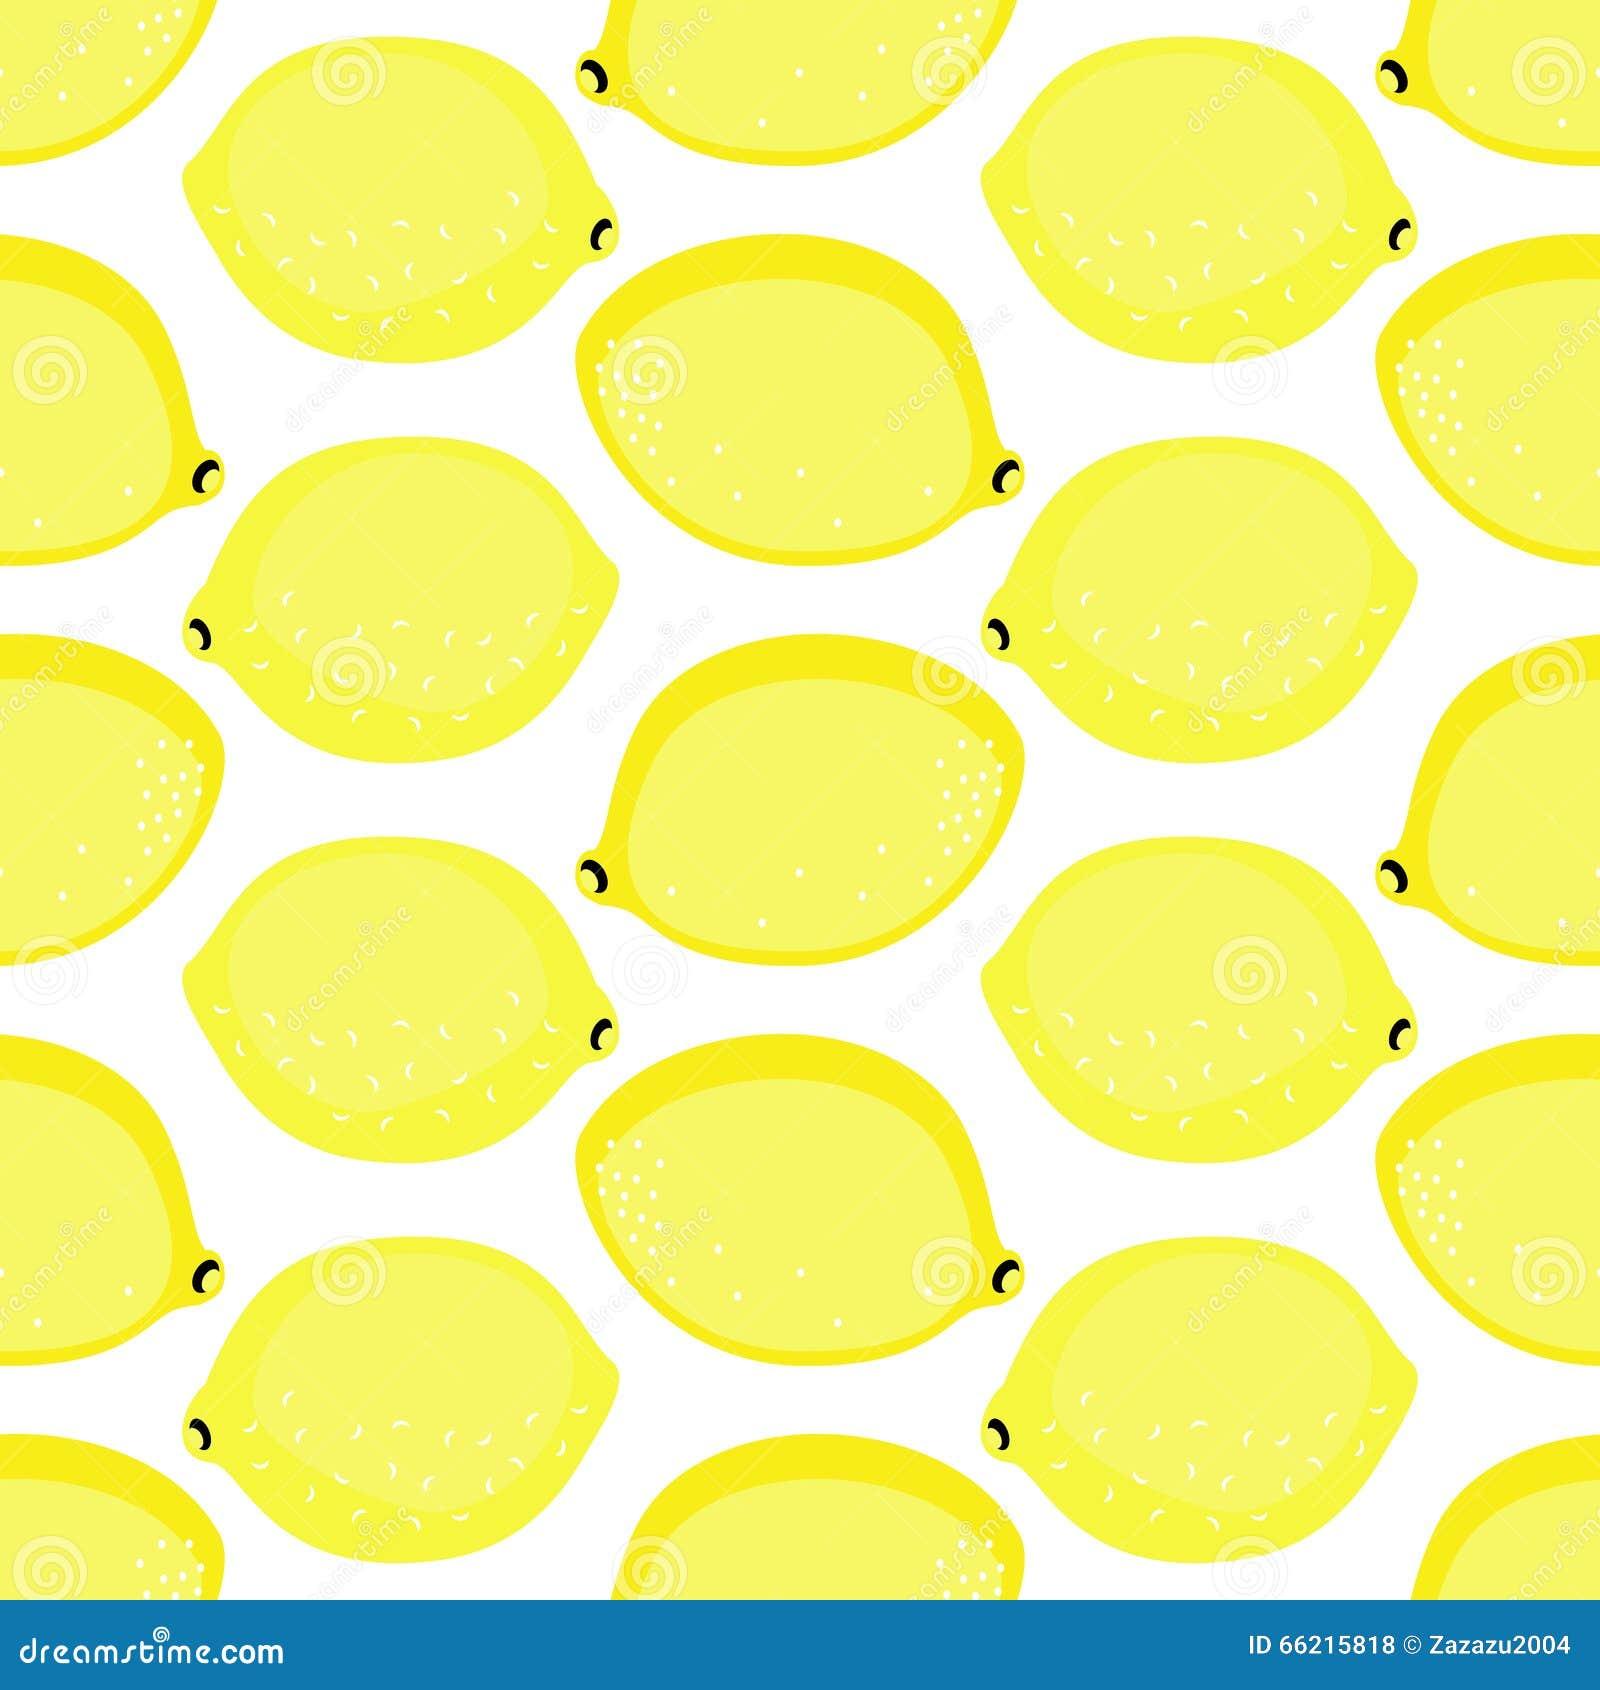 Seamless Background With Yellow Lemons Cute Vector Lemon Pattern